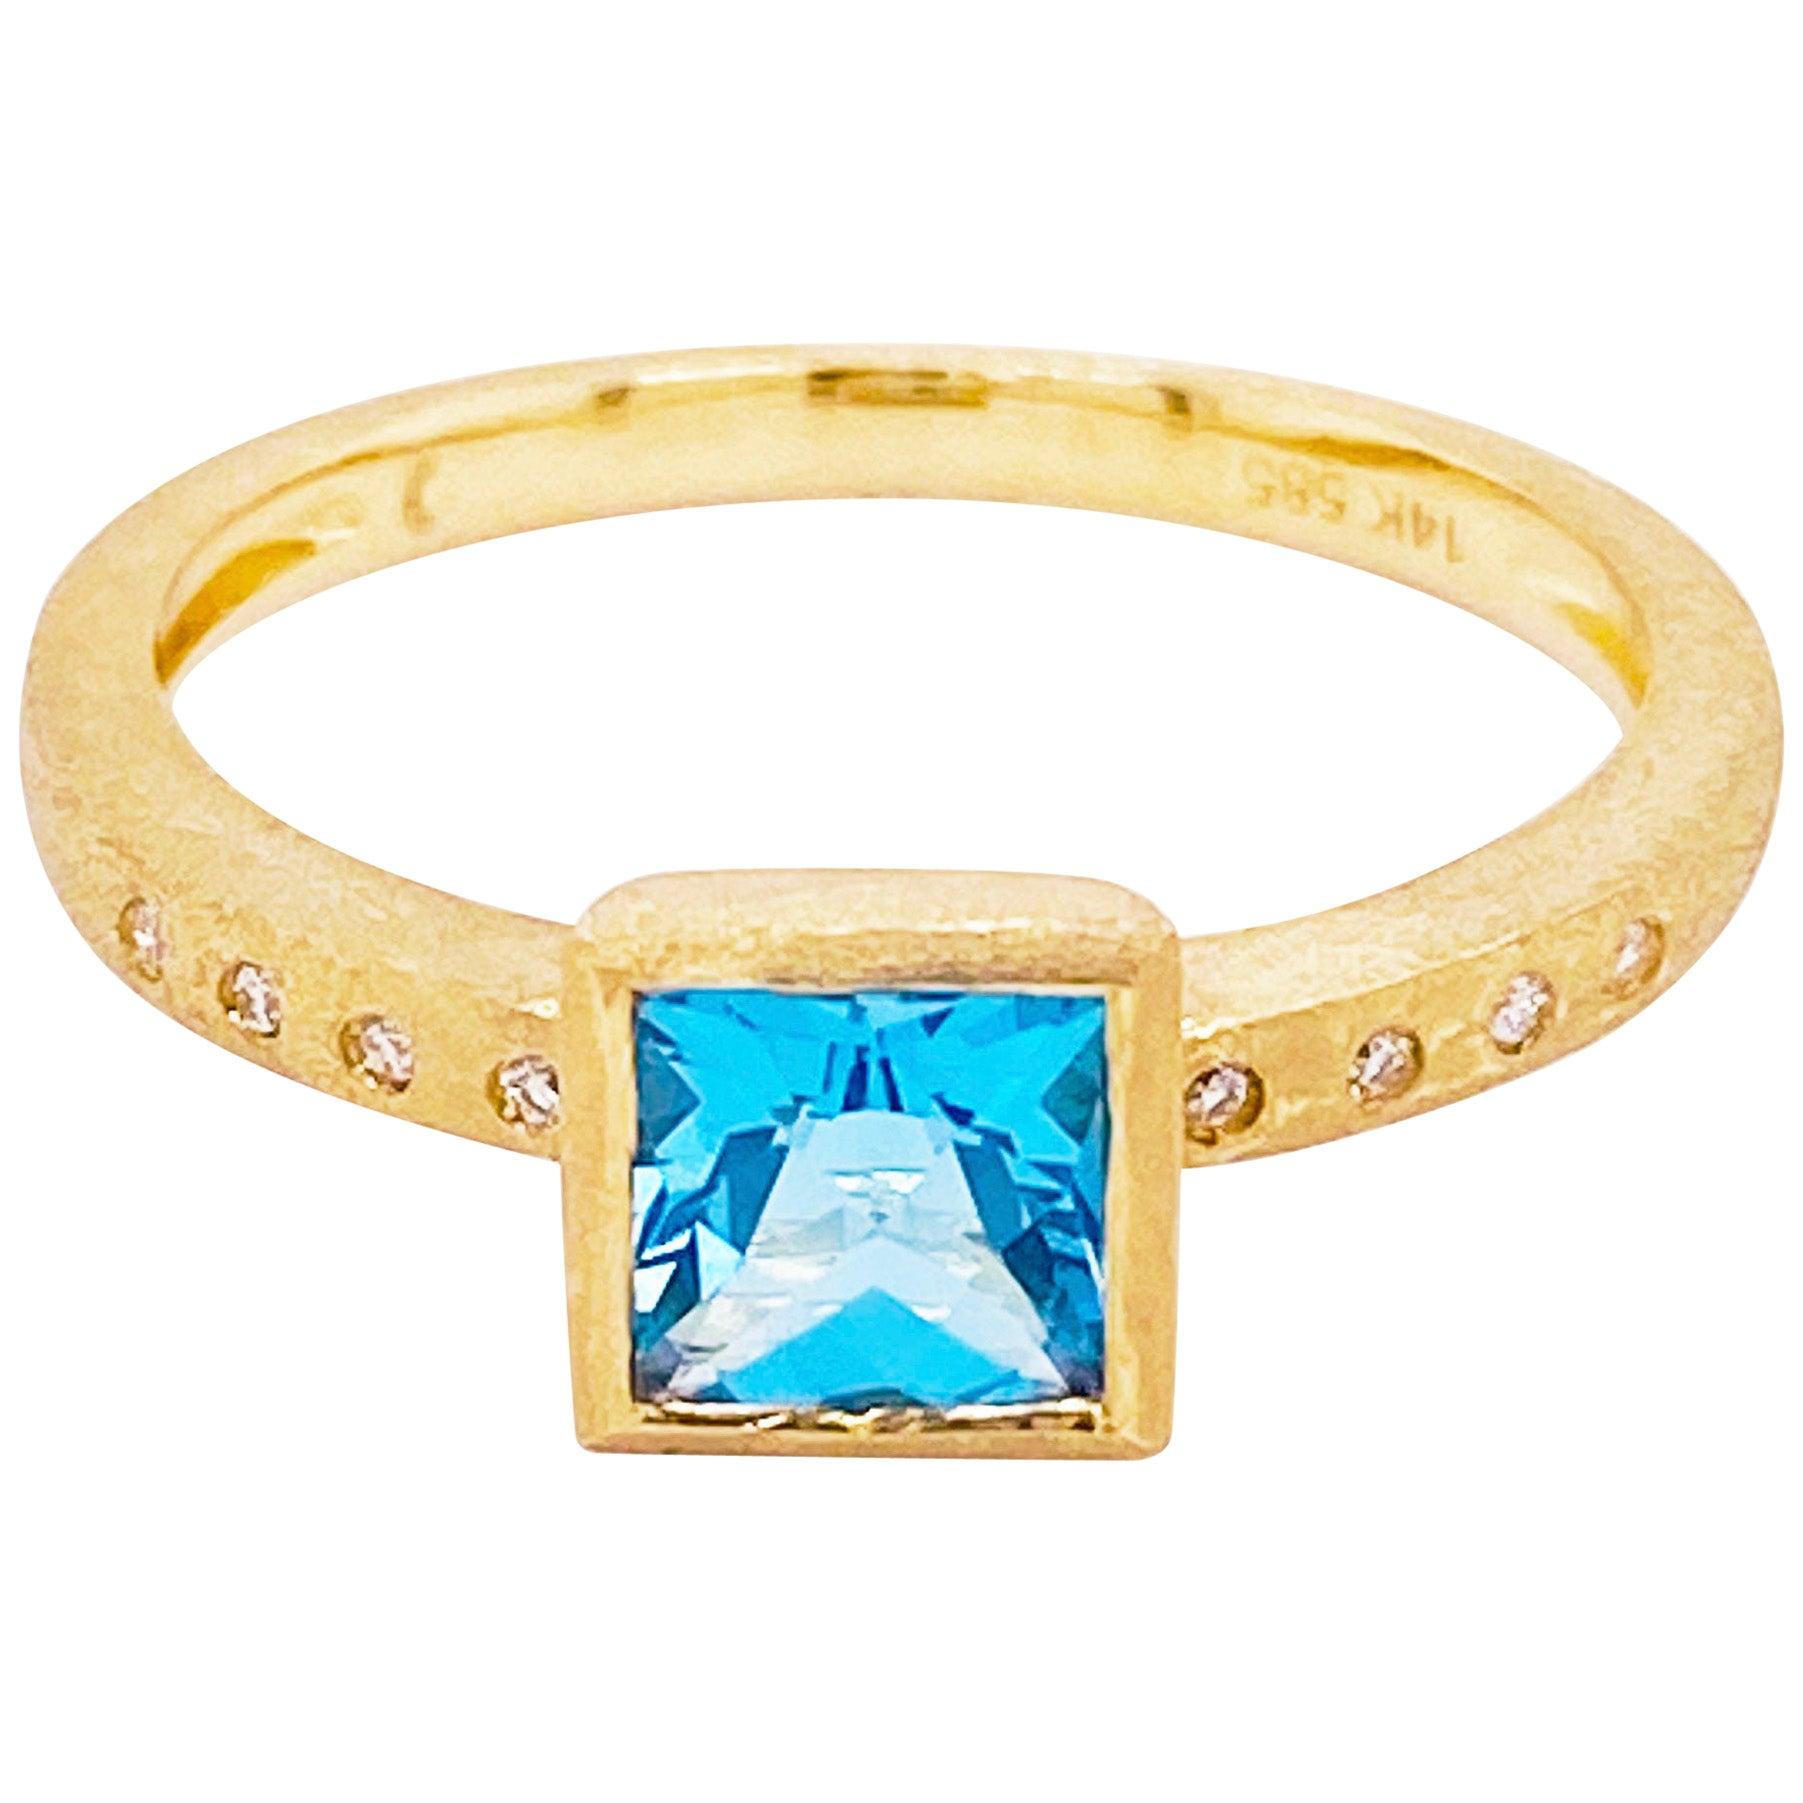 Topaz Diamond Ring, Blue Topaz, 14 Karat Yellow Gold, Satin Finish, Stack